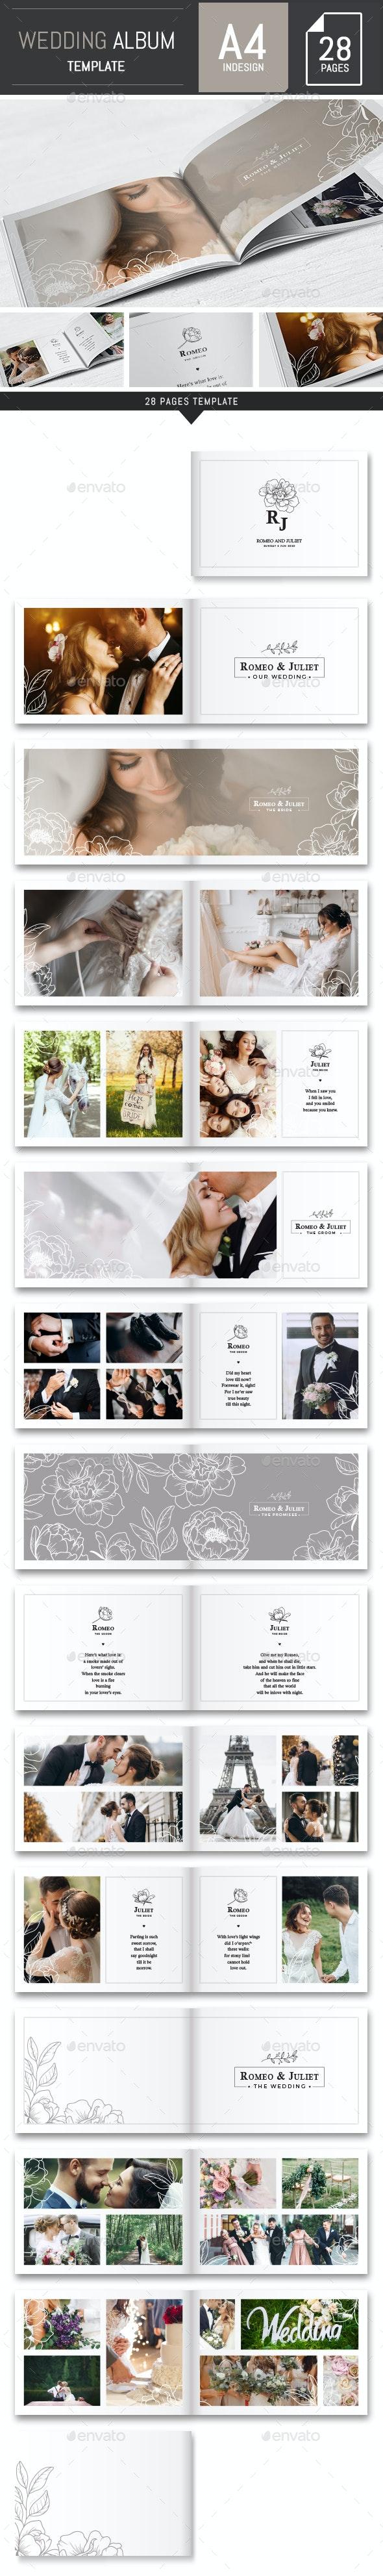 Wedding Photo Album Horizontal Brochure Template - InDesign - Photo Albums Print Templates